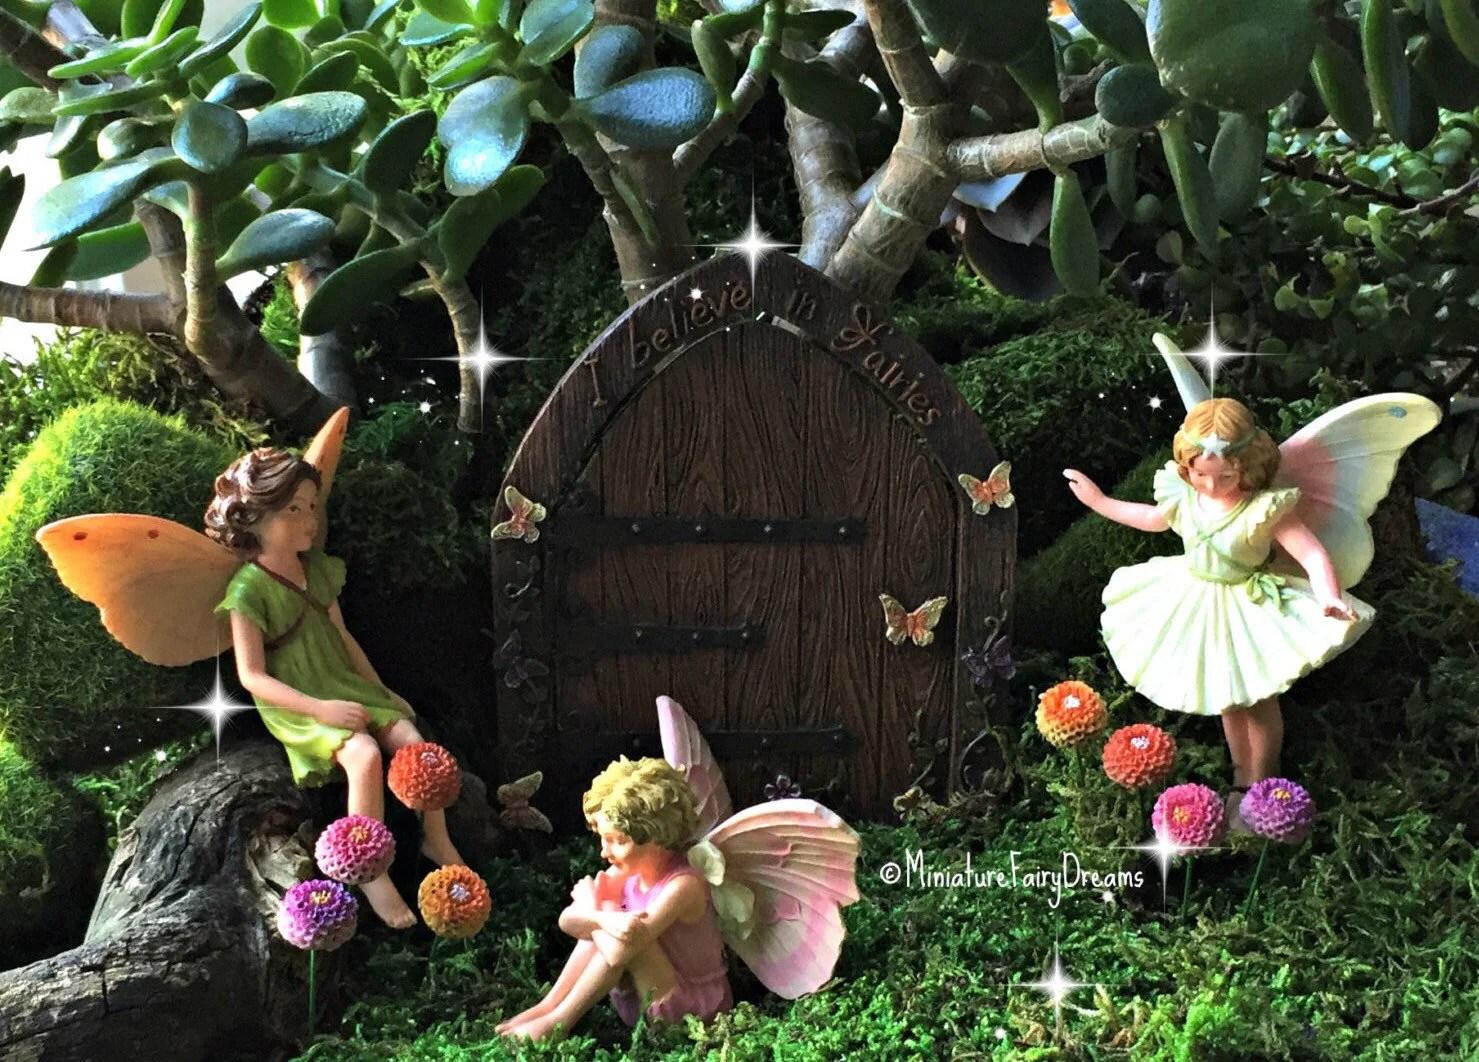 Joyous Get Shipping Estimate Flower Fairy Garden Fairy Miniature Mini Fairy Garden Flowers Miniature Fairy Garden Flowers garden Fairy Garden Flowers